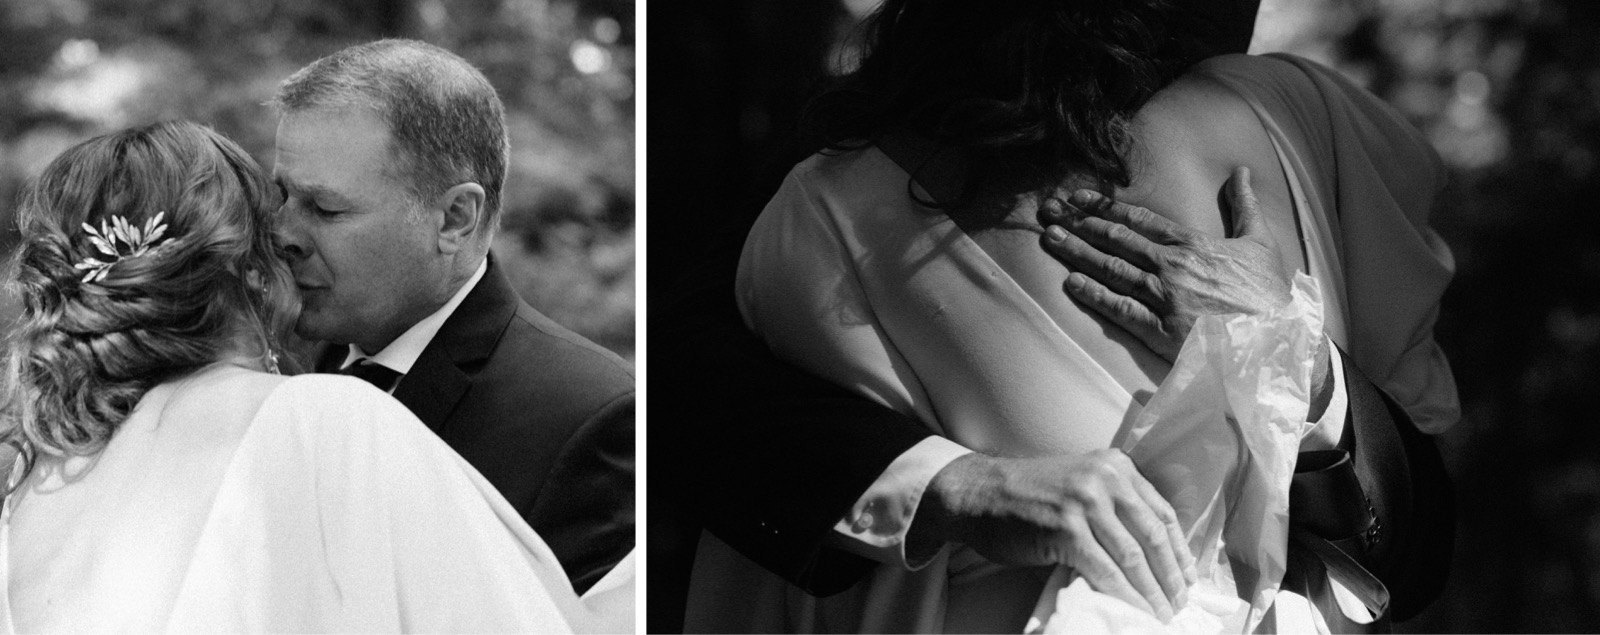 019_Emily & Jeff Wedding 0176_Emily & Jeff Wedding 0163_moments_bride_first-look_father_wedding